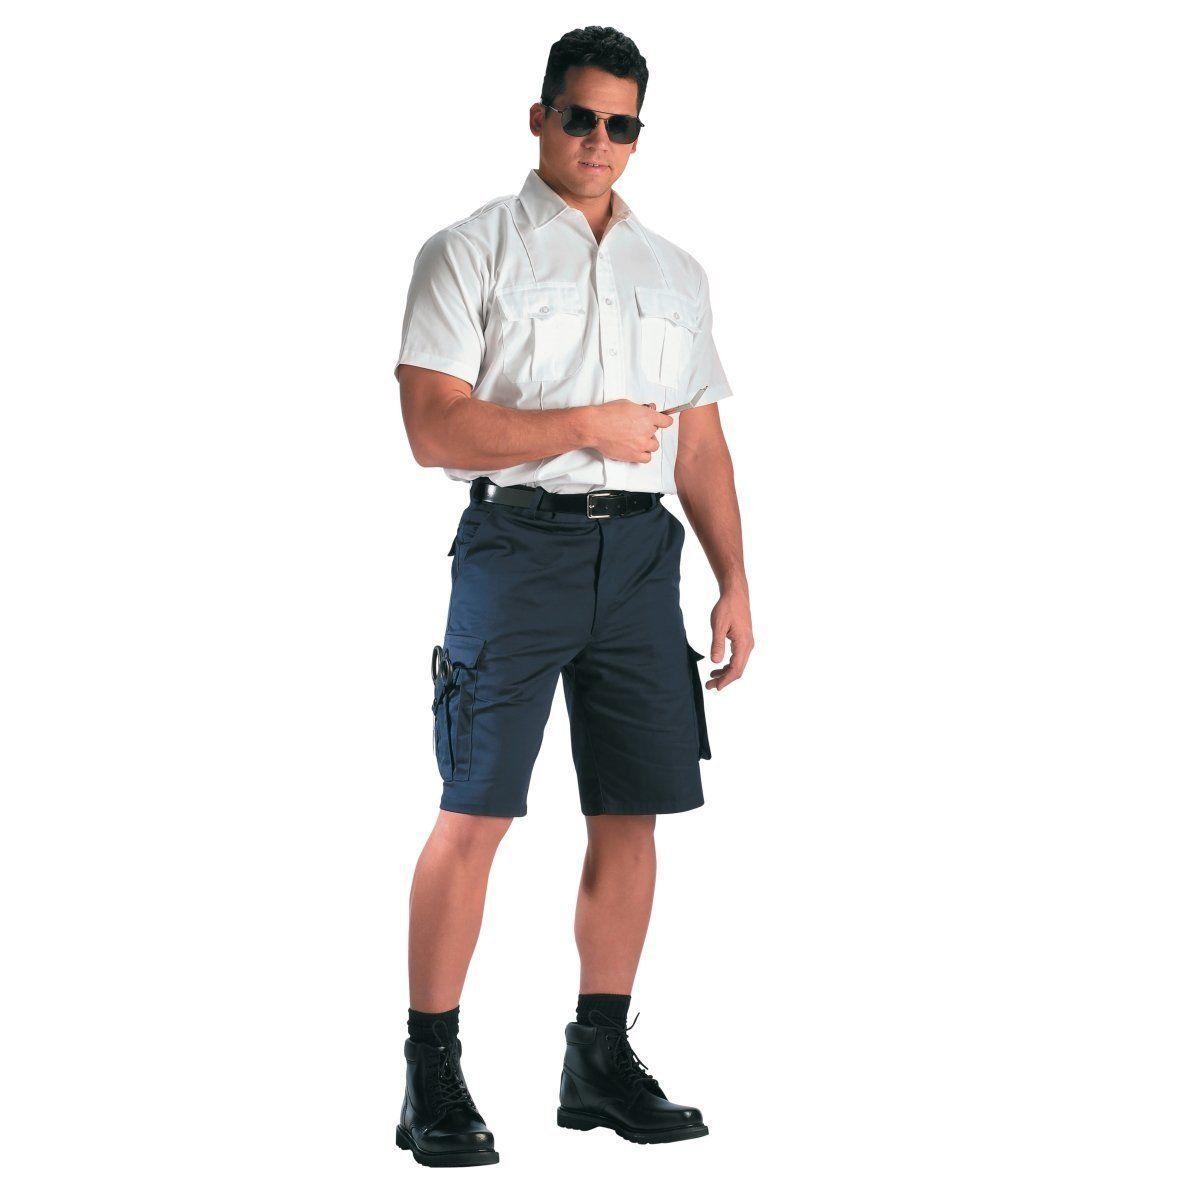 8741a9699b7 EMS EMT Navy Blue Tactical Shorts Rothco Uniforms Adult Unisex XL 78221 New  - $30.35